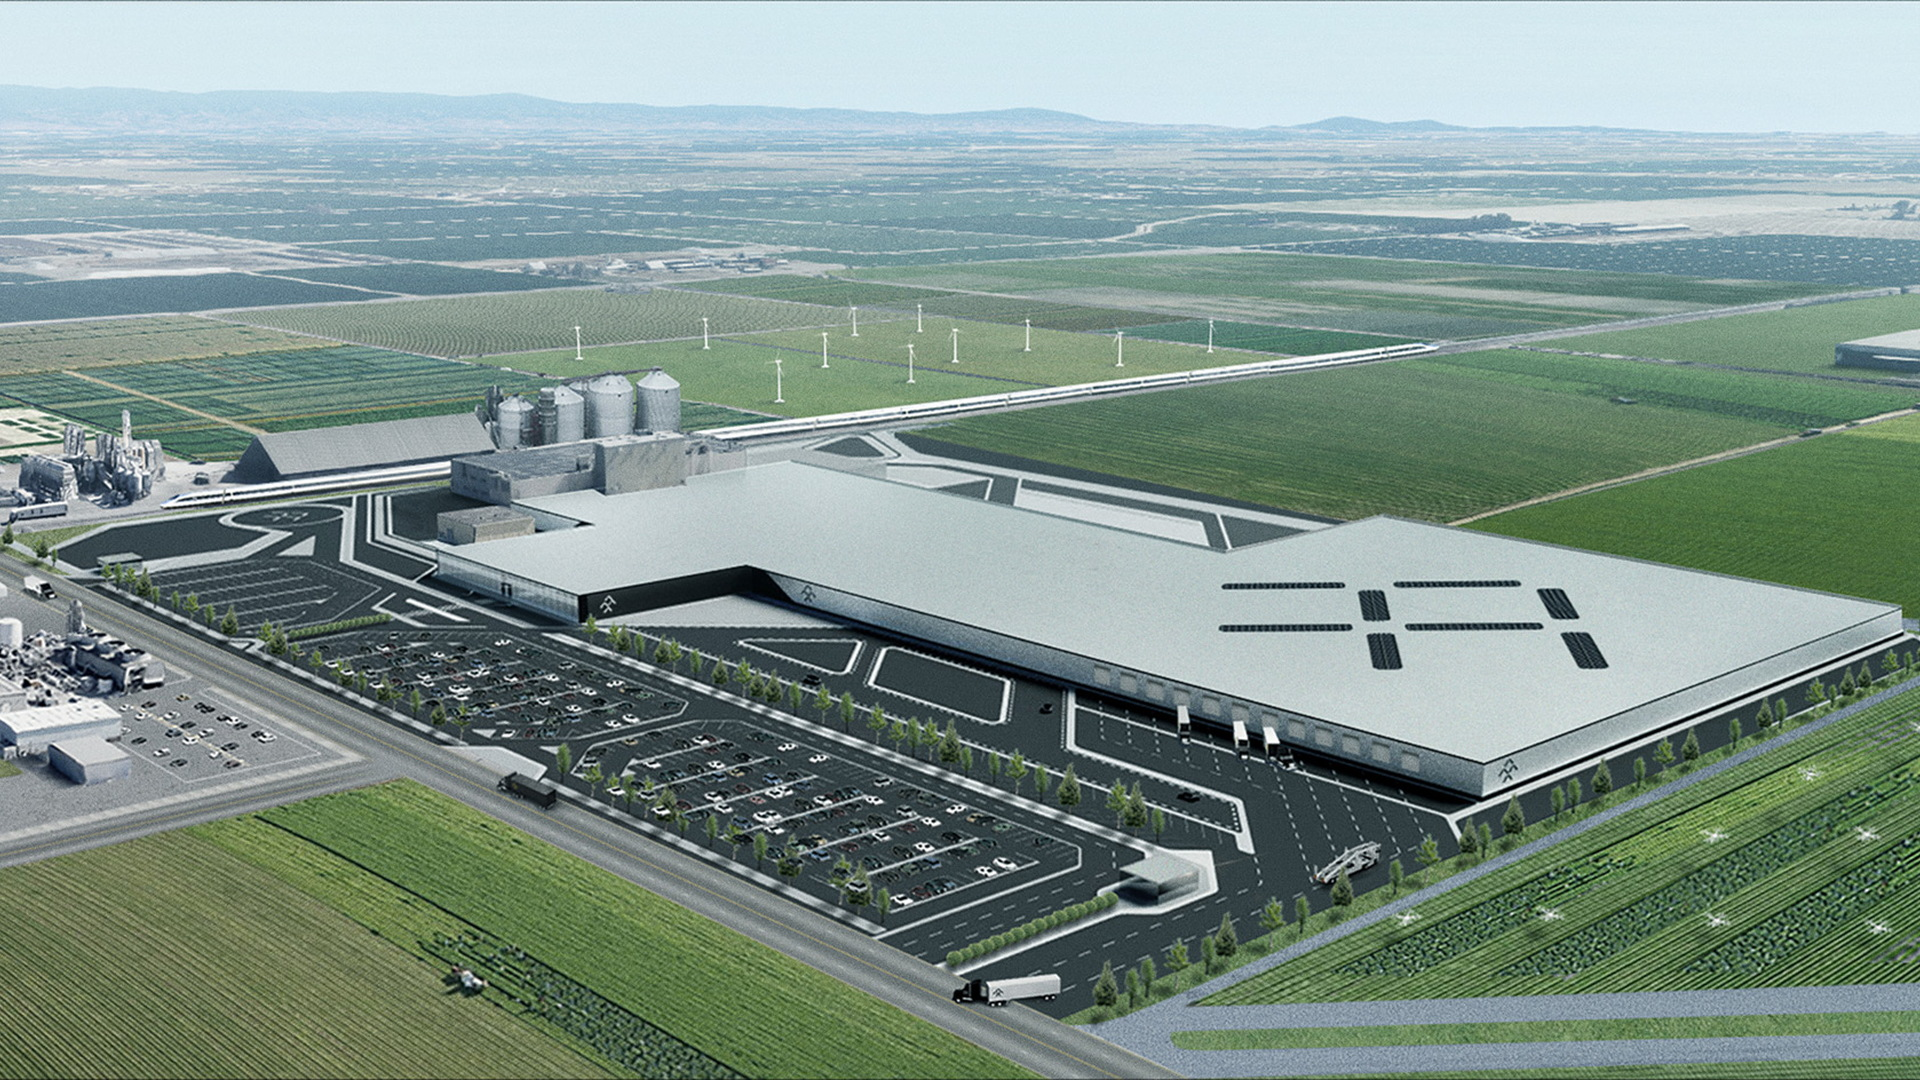 Artist's impression of Faraday Future's proposed plant in Hanford, California